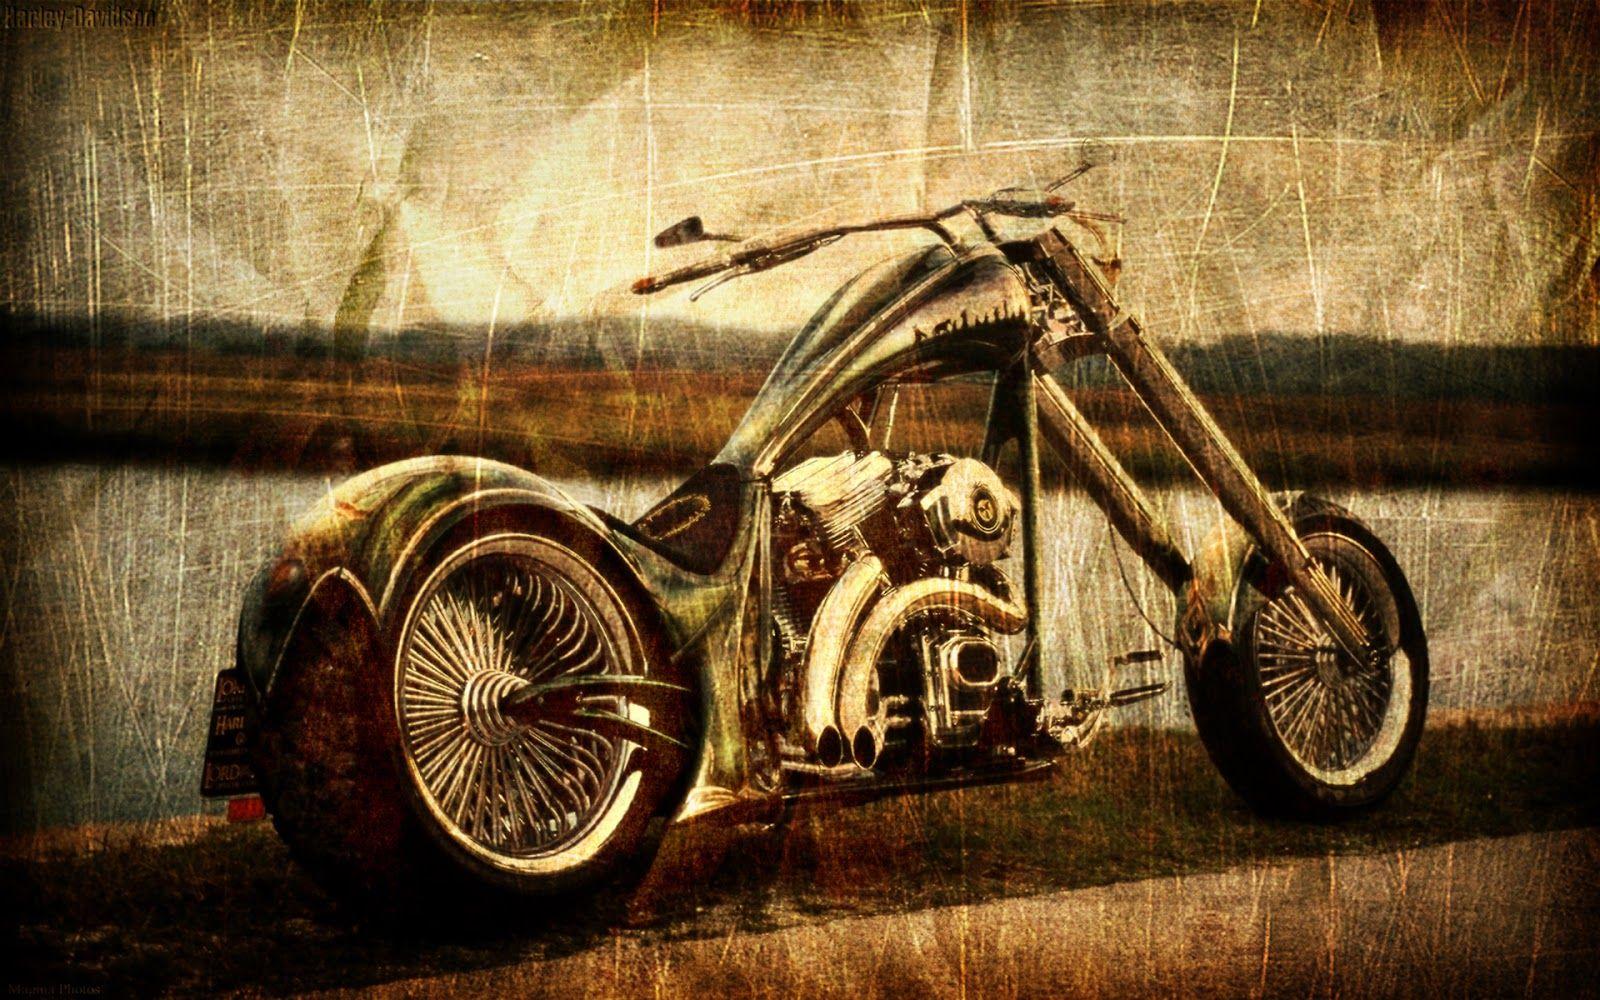 Hd Vintage Wallpaper Hd Wallpapers Pretty Motorcycle Wallpaper